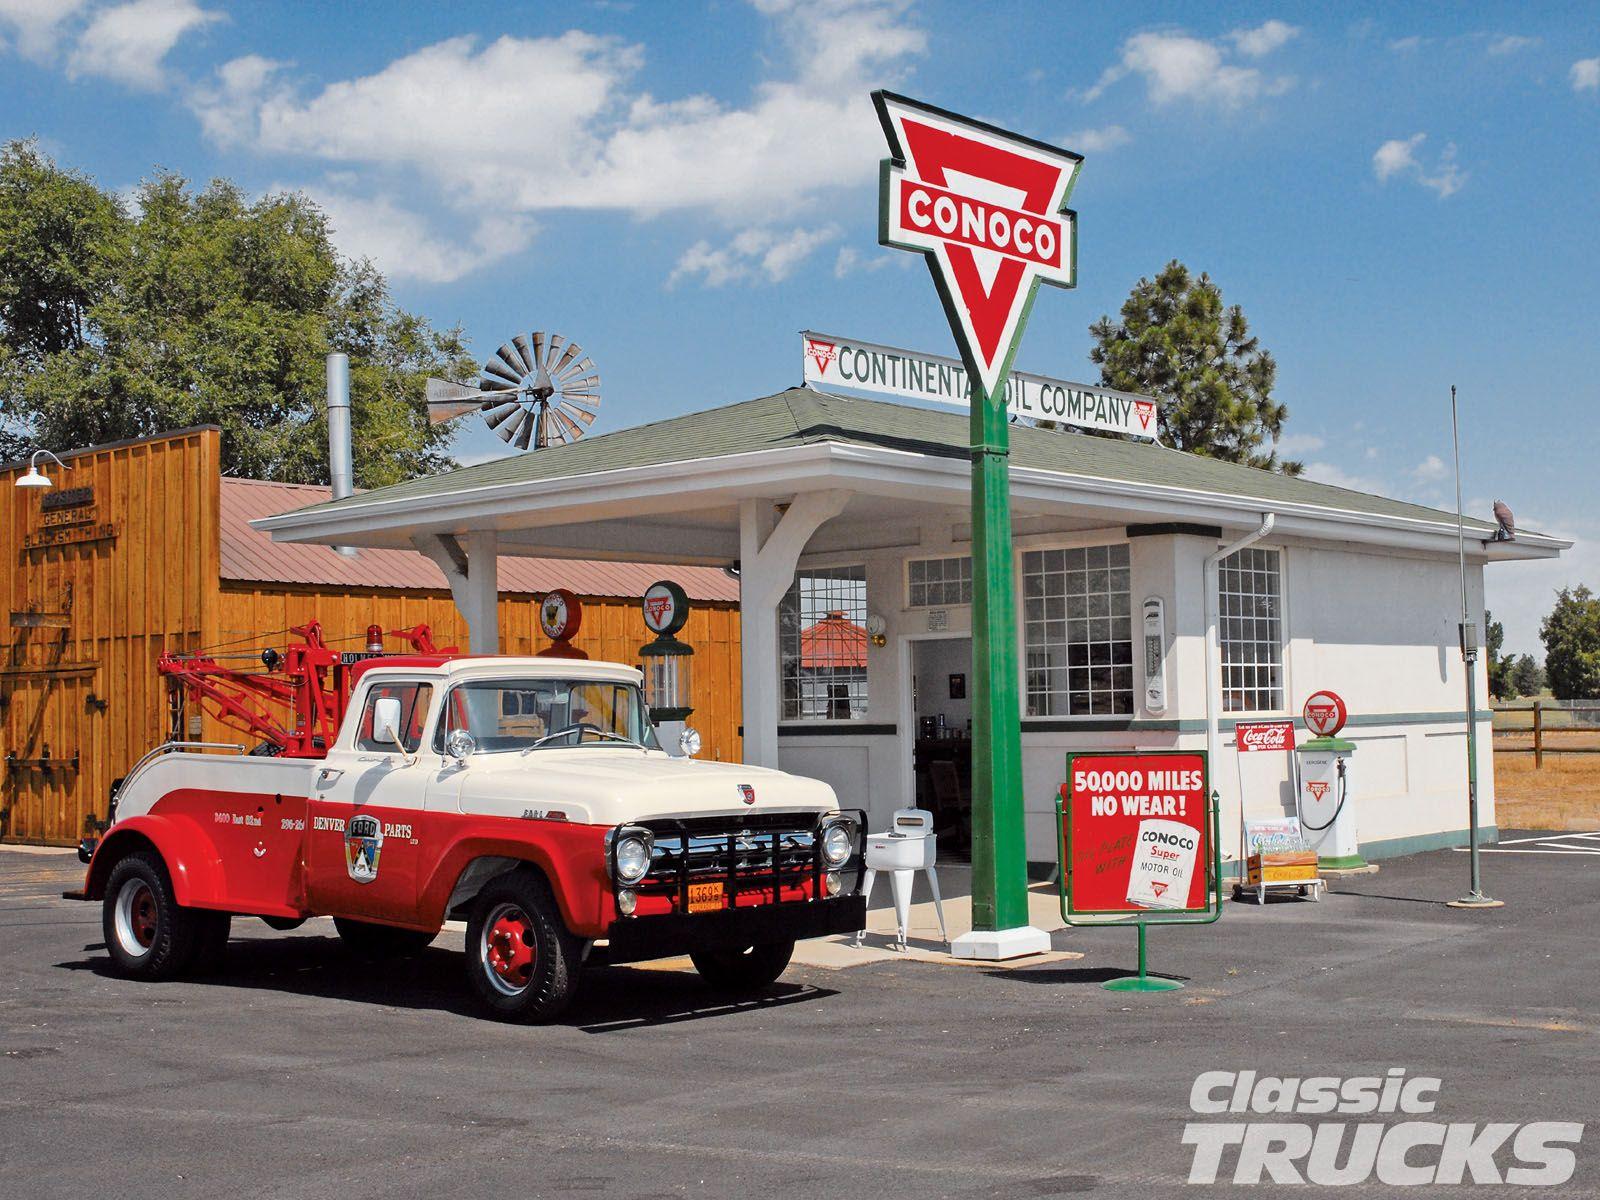 0612clt 07 O 1957 Ford F350 Pickup Truck Conoco Gas Station Jpg